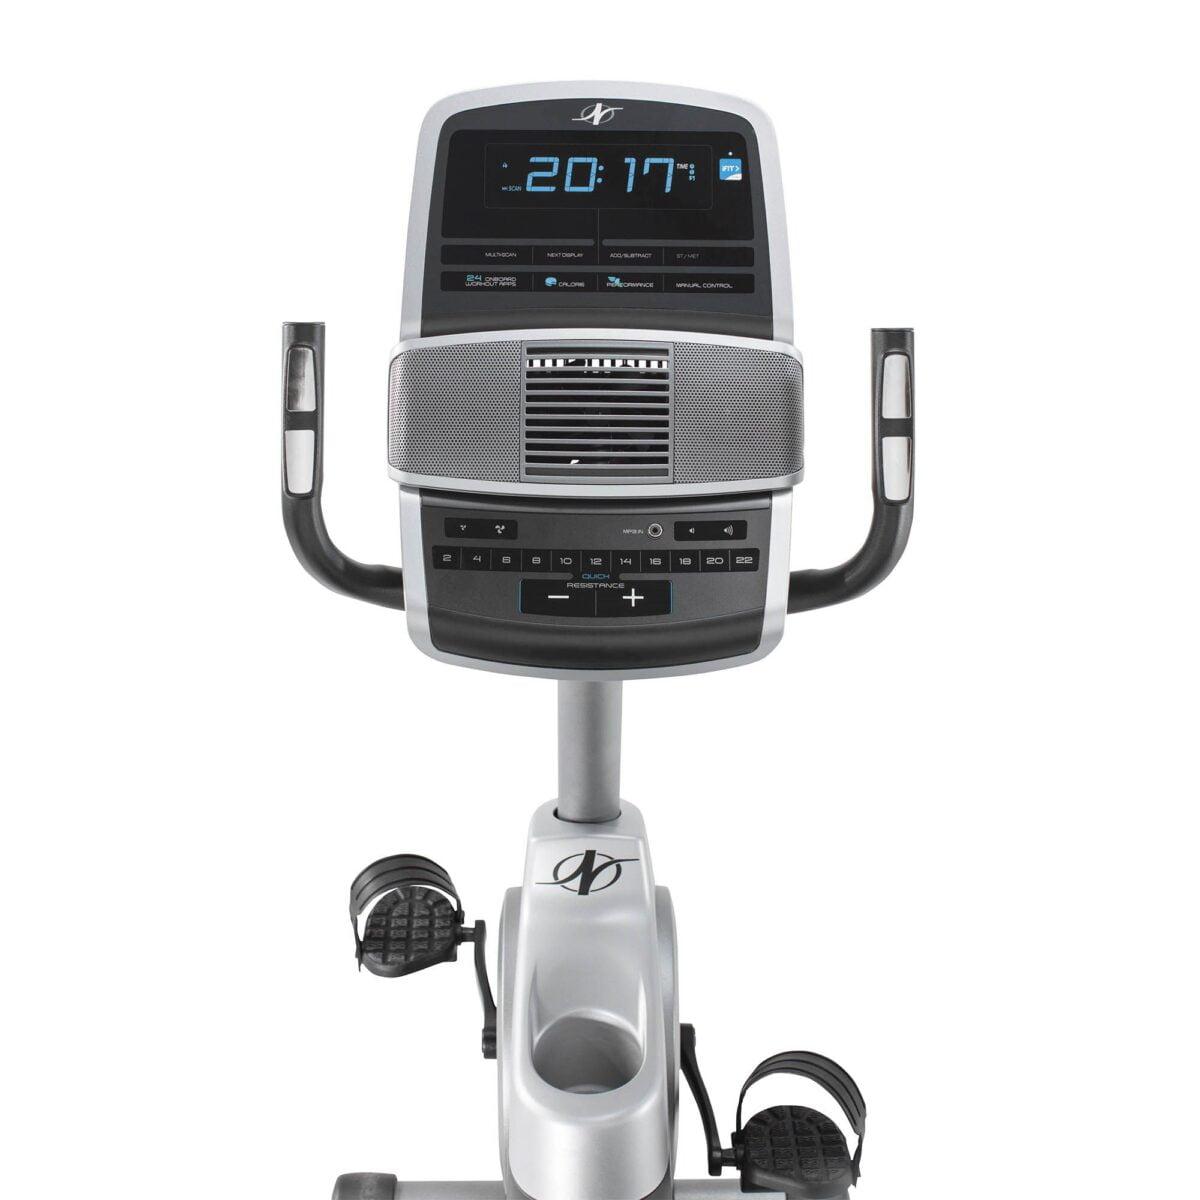 NordicTrack VR19 Bike LCD Panel Voucher Code